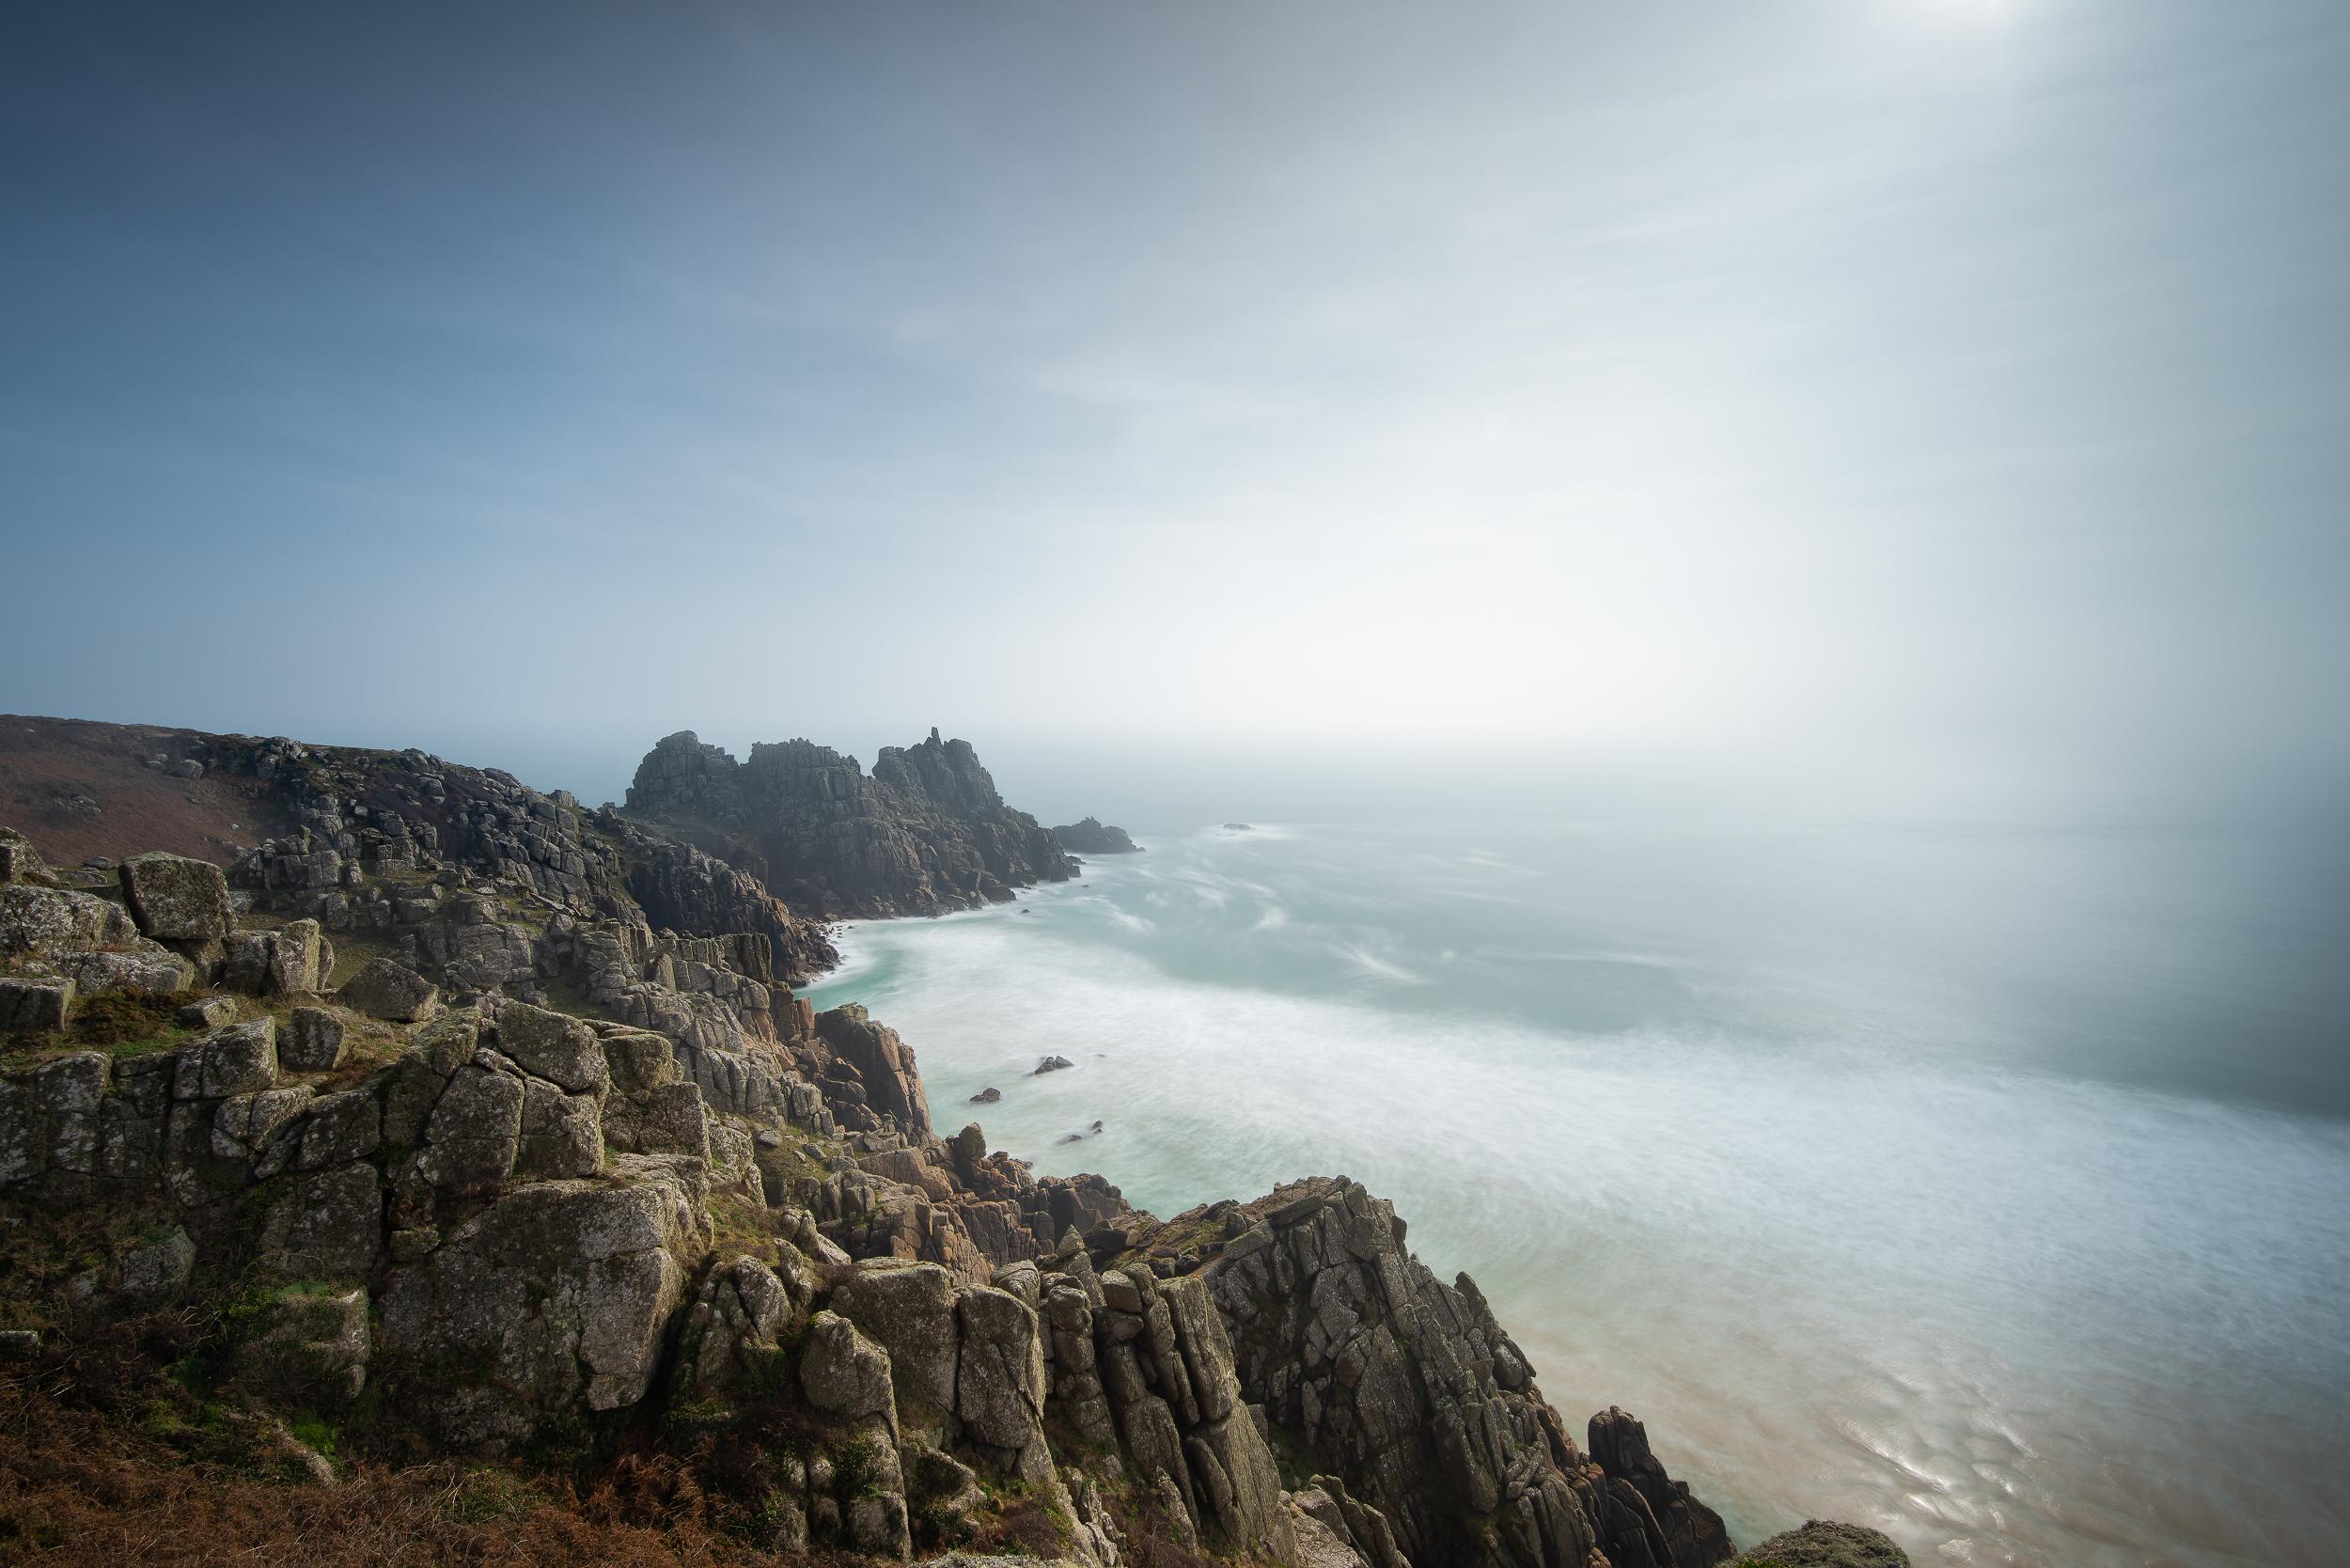 cornwall-sea-rocks.jpg